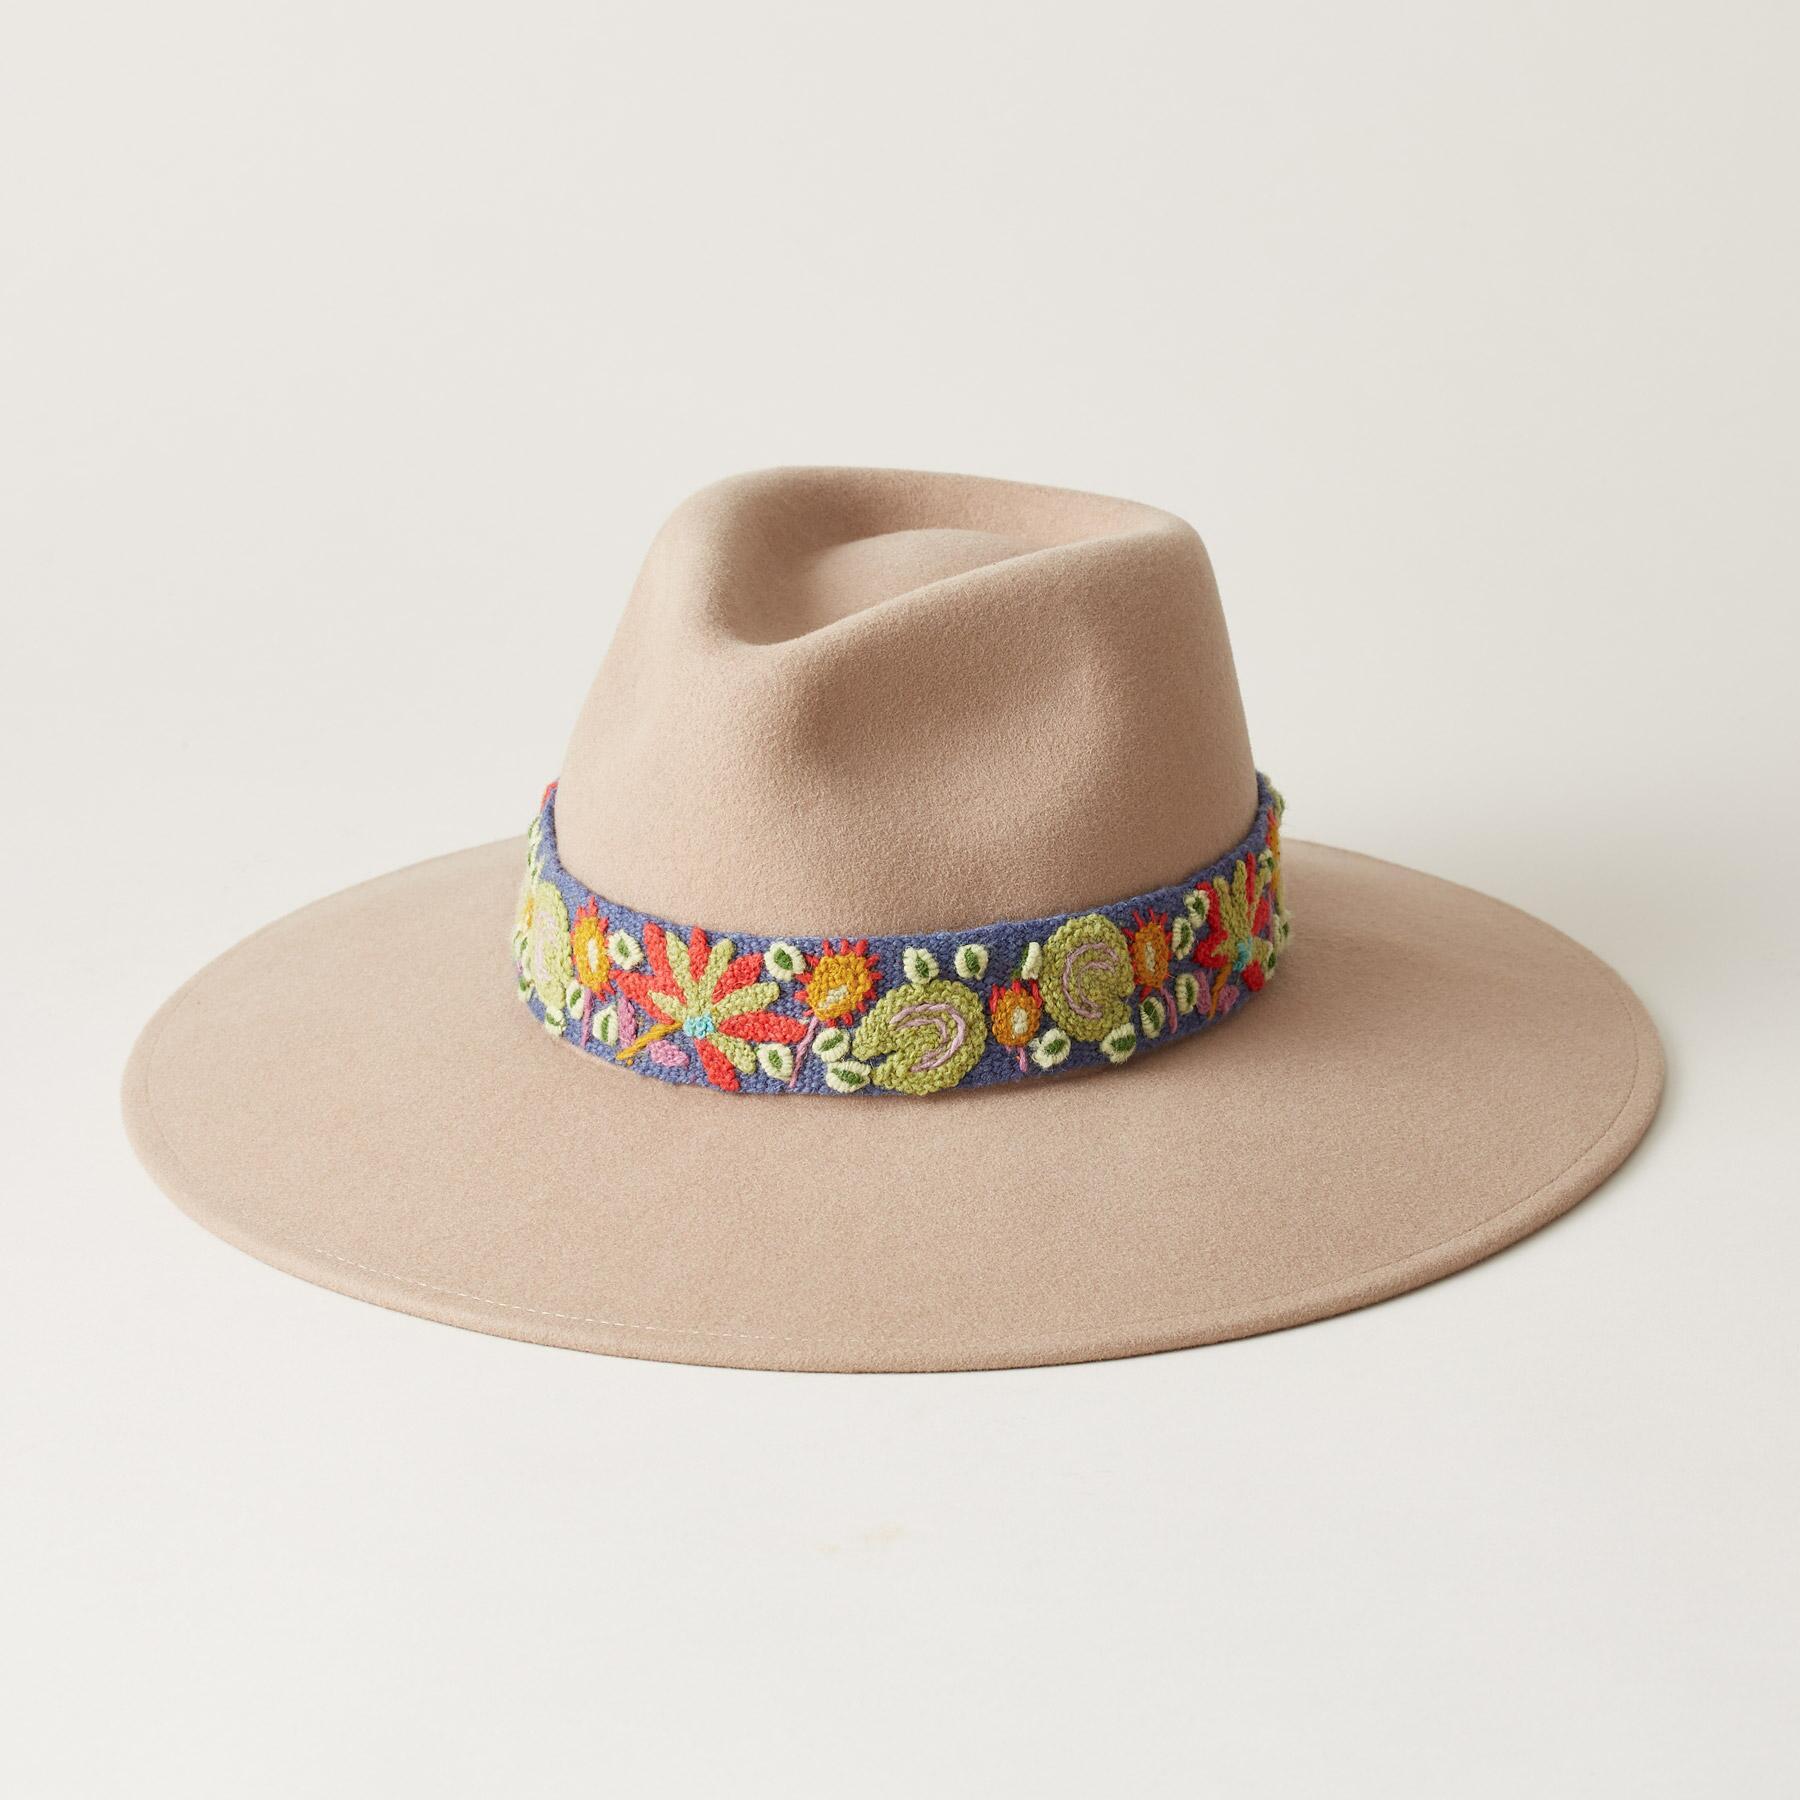 FIELD & FLORA HAT: View 1